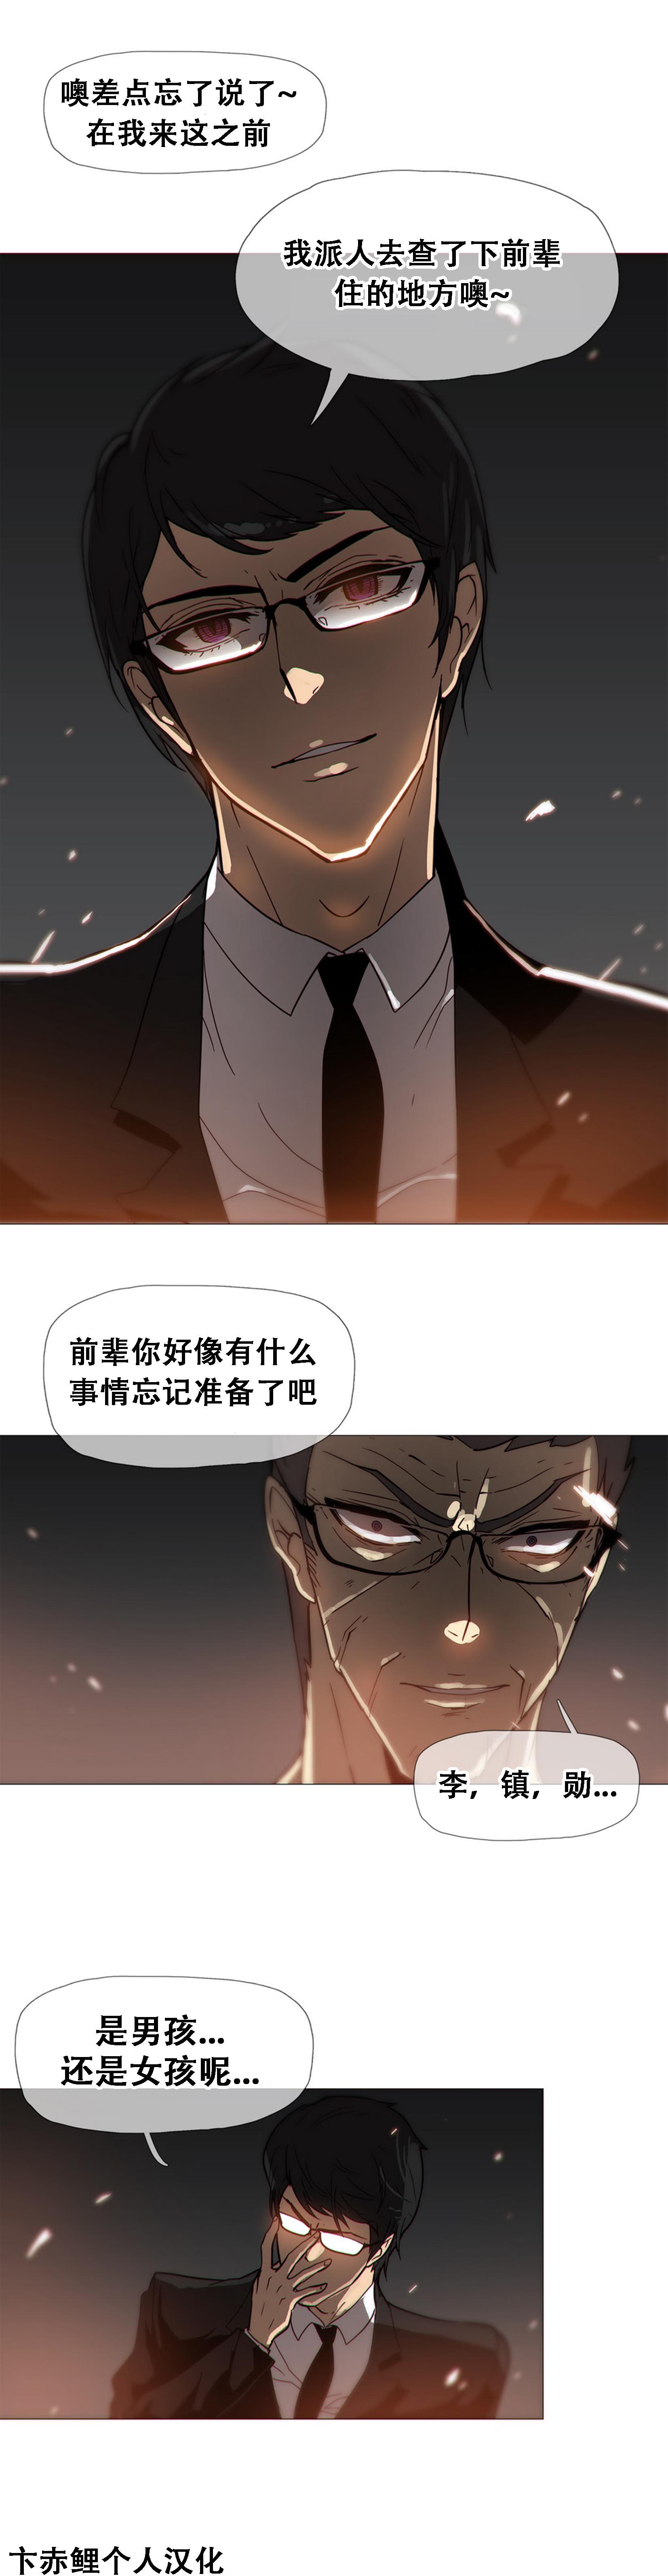 HouseHold Affairs 【卞赤鲤个人汉化】1~21话(持续更新中) 371